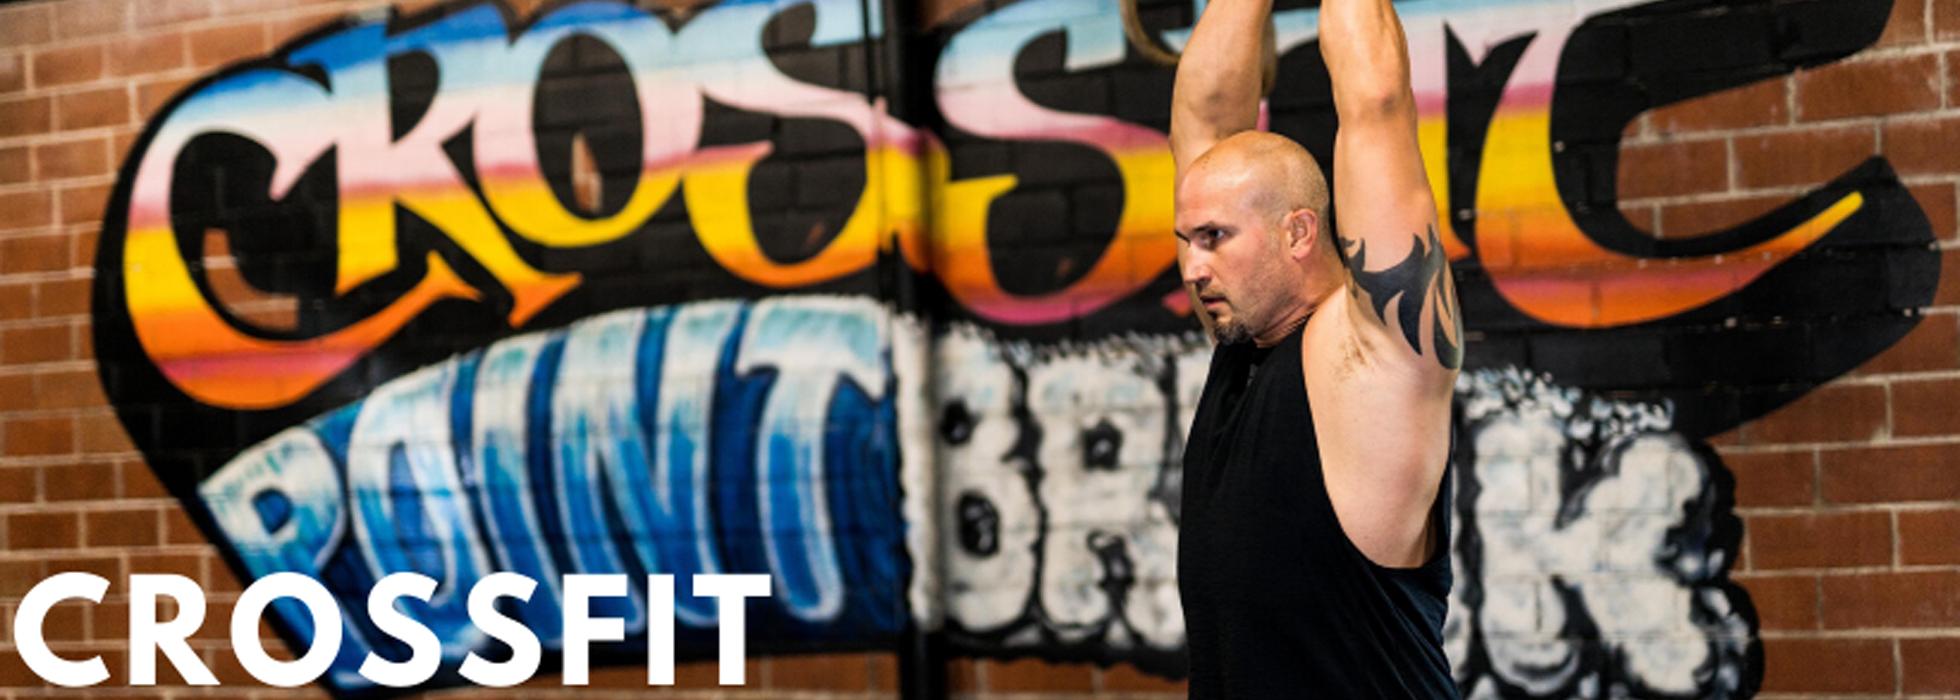 CrossFit Training in Spring TX, CrossFit Training near Houston TX